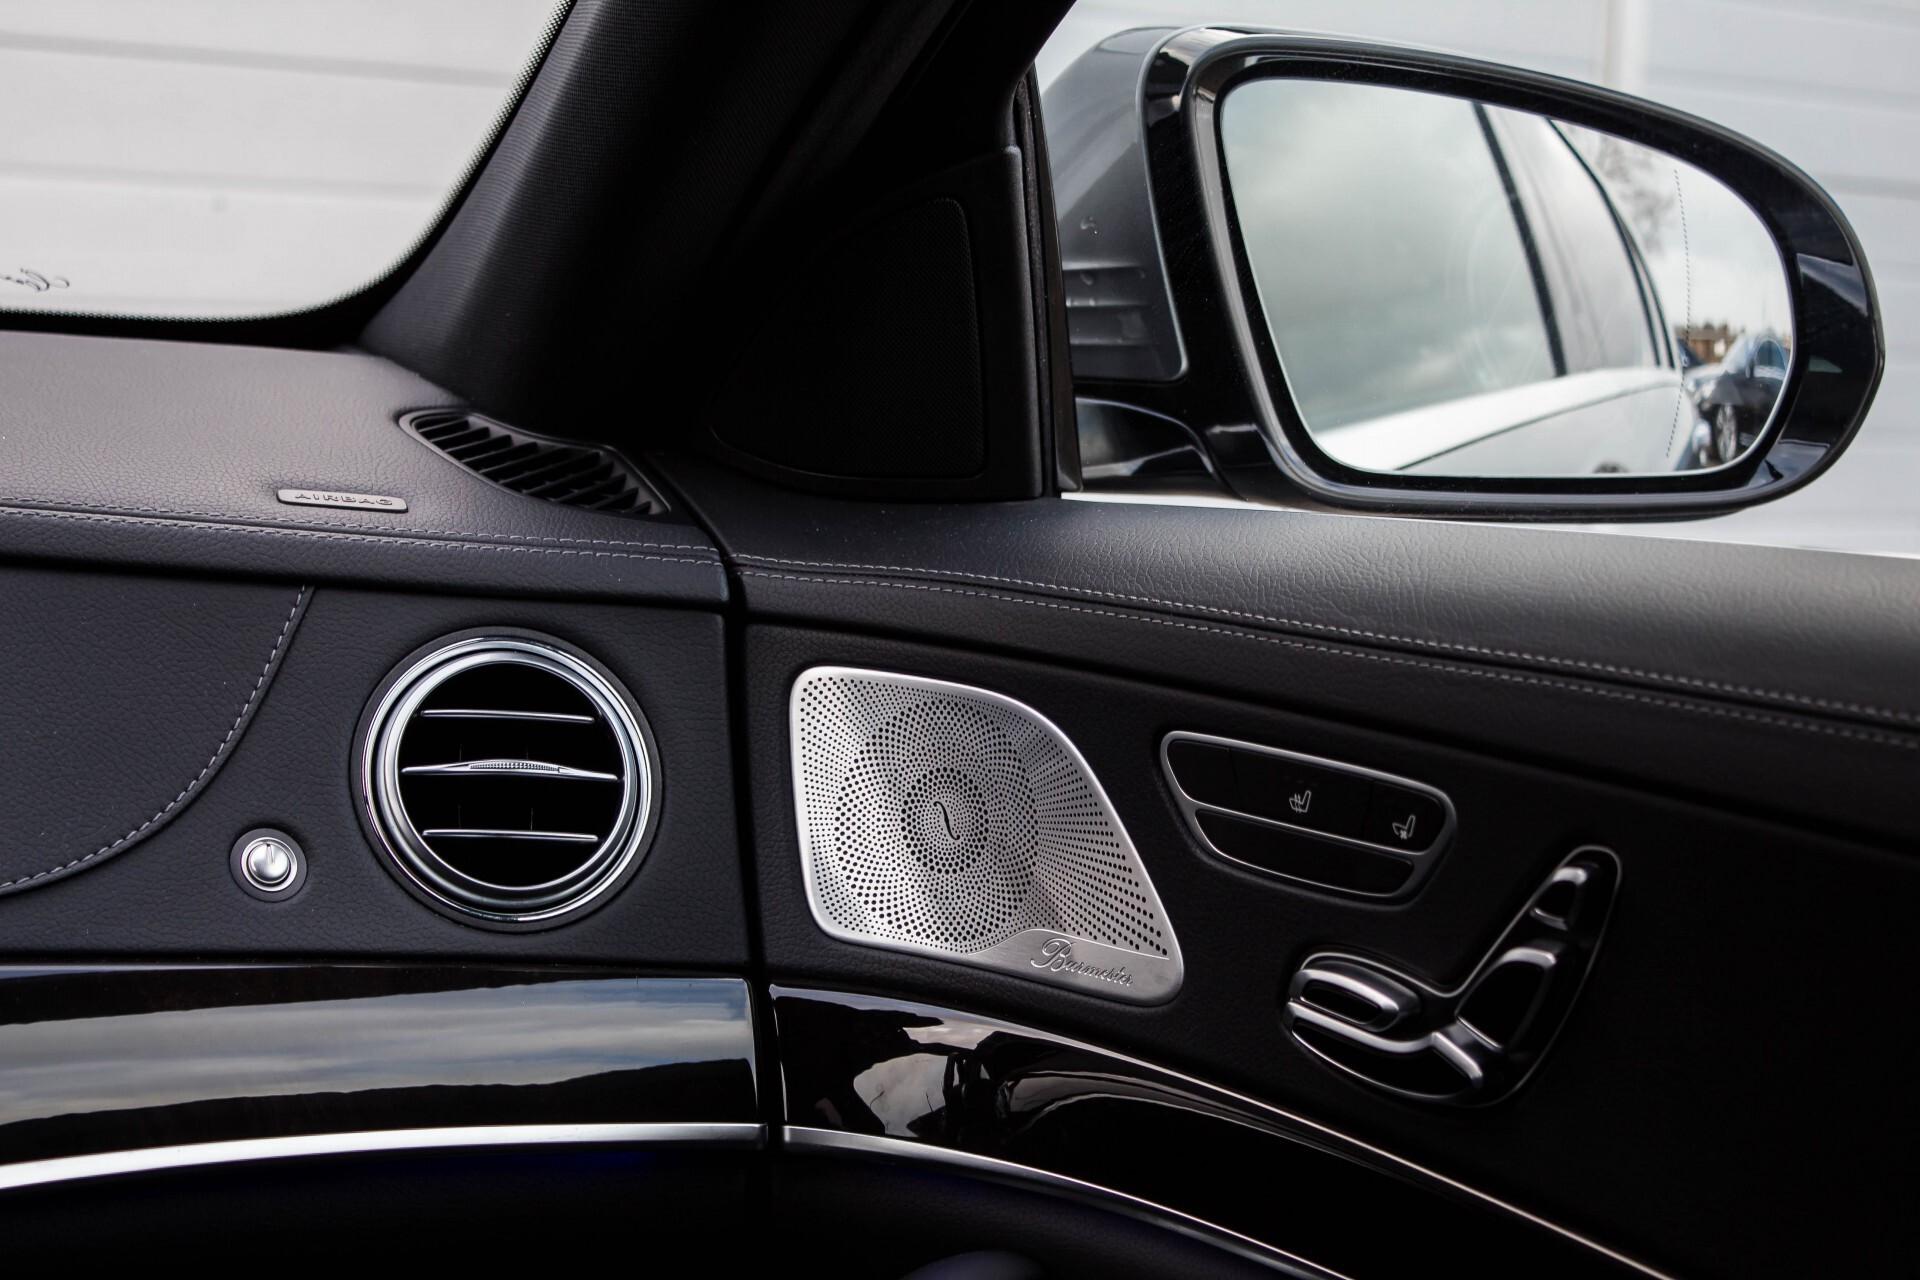 Mercedes-Benz S-Klasse 350 BlueTEC 63 AMG Panorama/Distronic/Keyless/Massage/Burmester Aut7 Foto 32